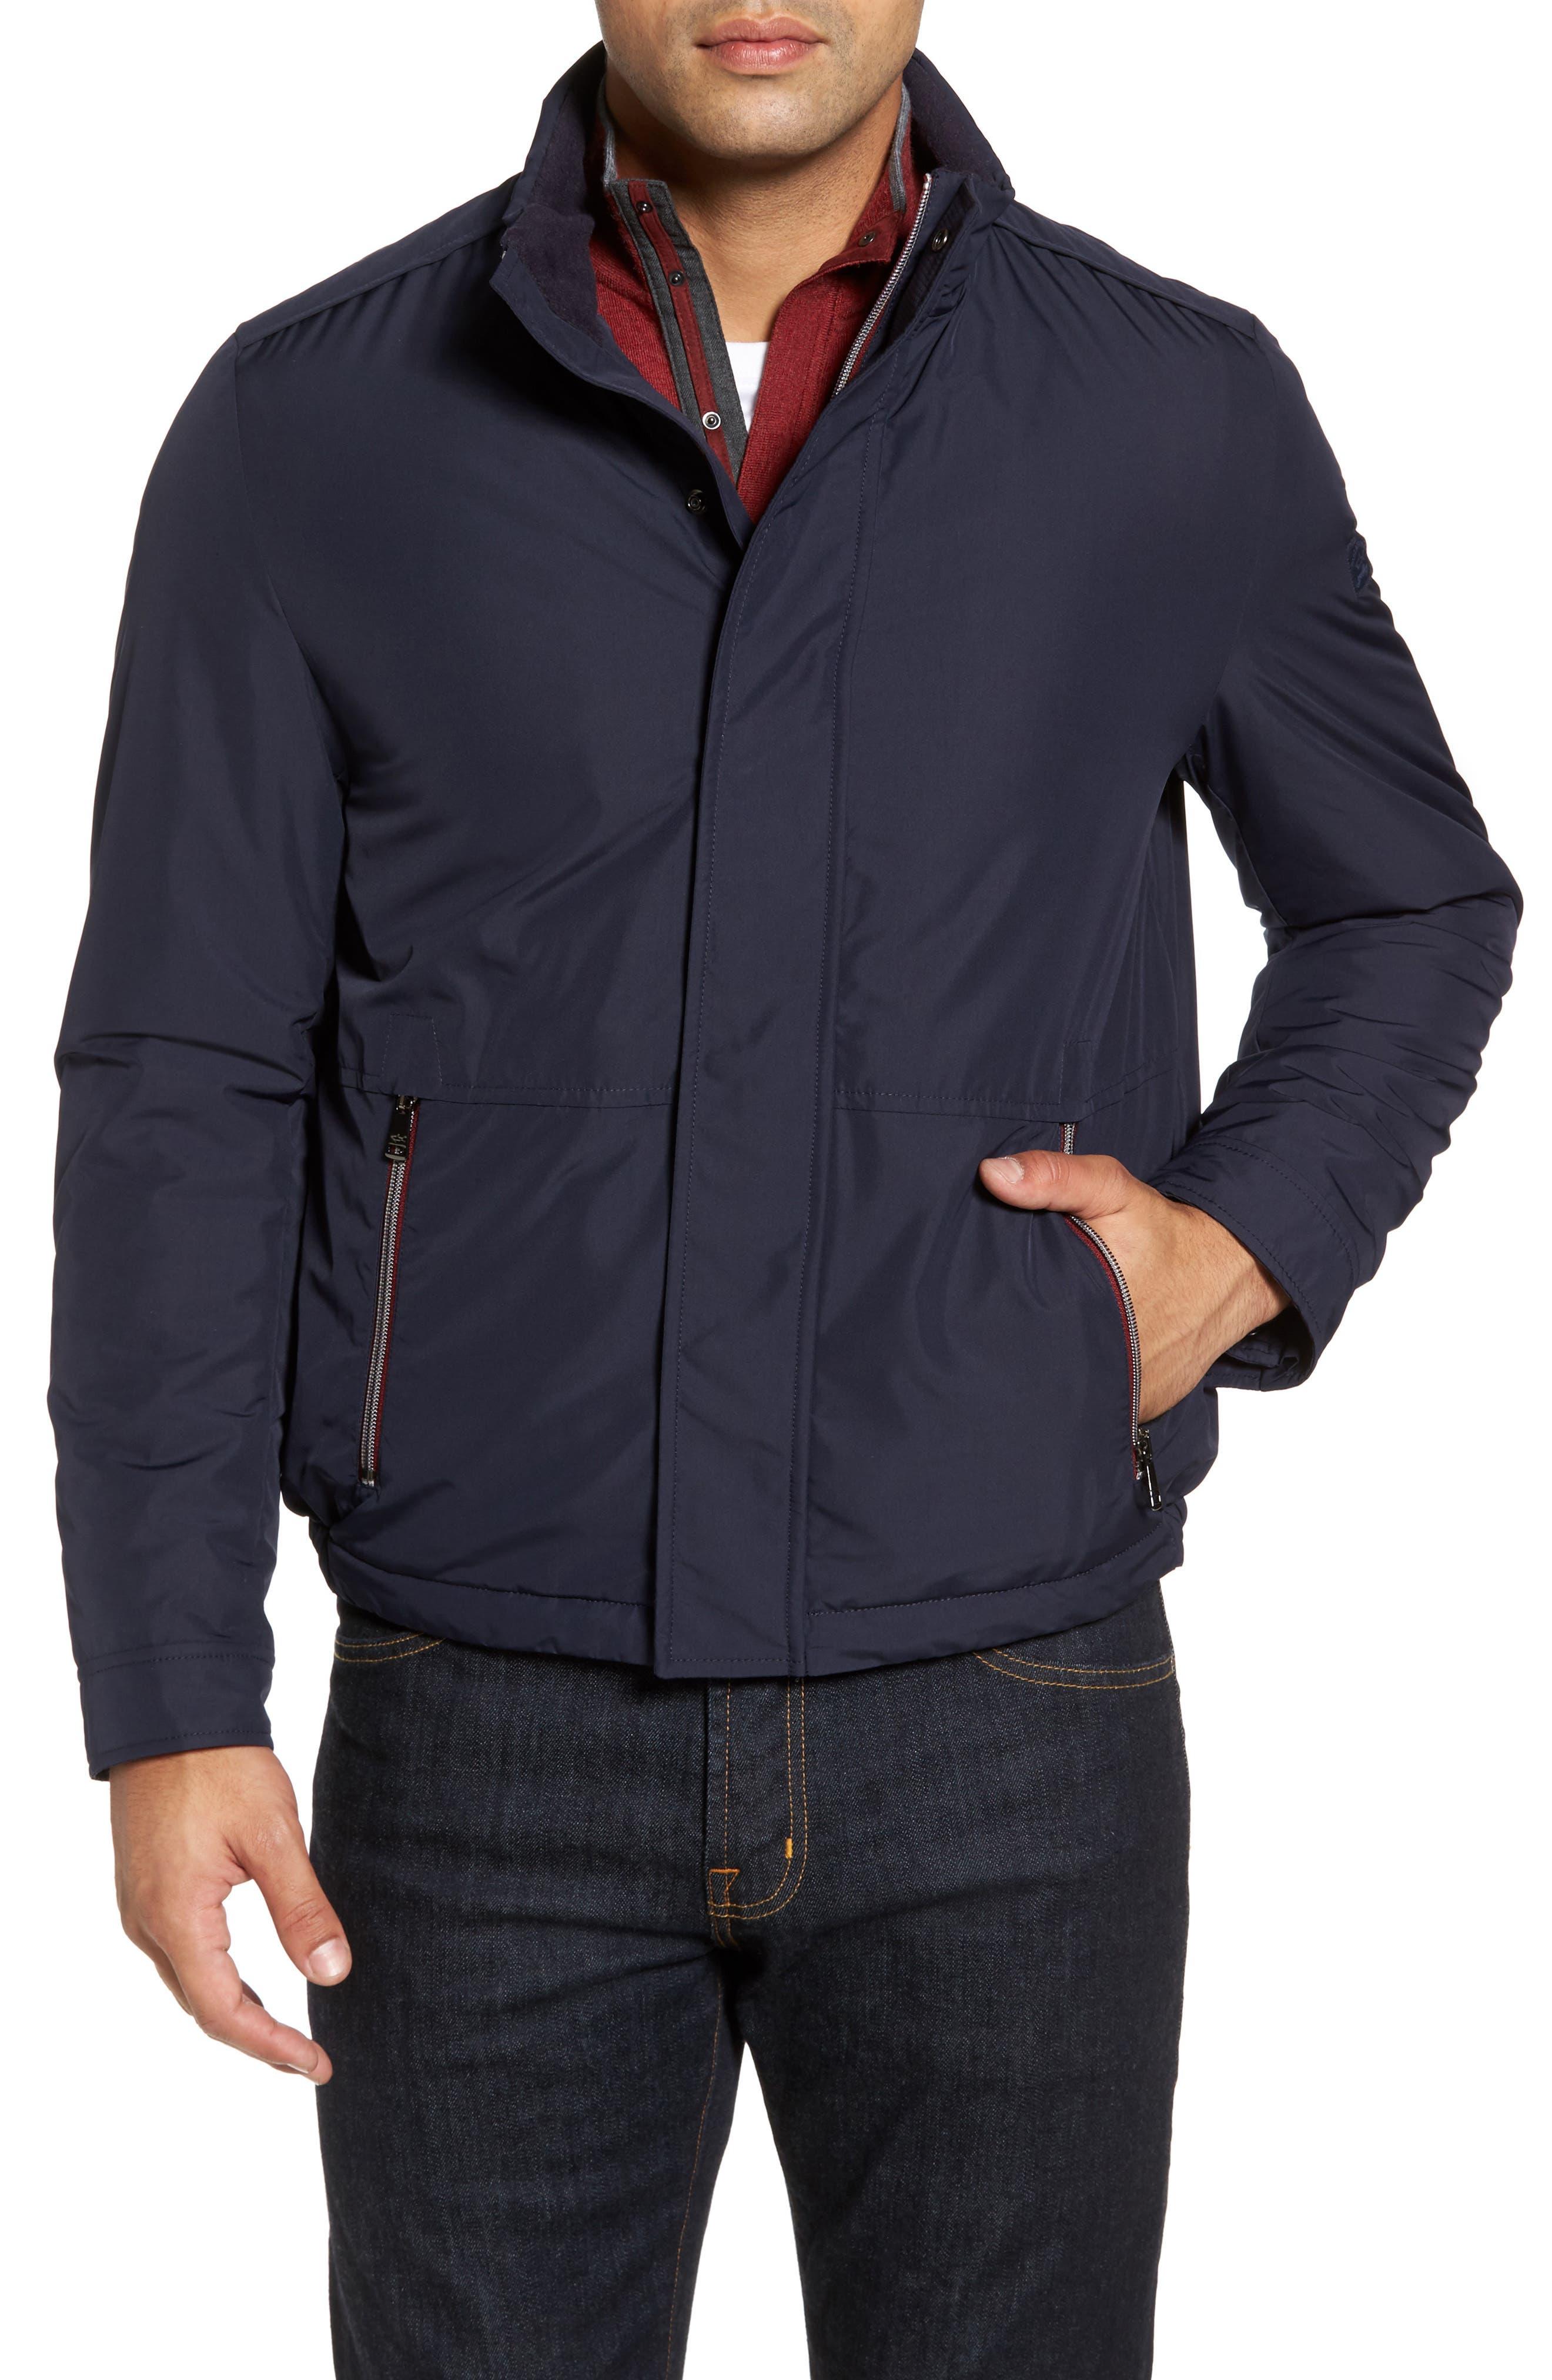 Paul&Shark Fleece Lined Hooded Jacket,                             Alternate thumbnail 4, color,                             400